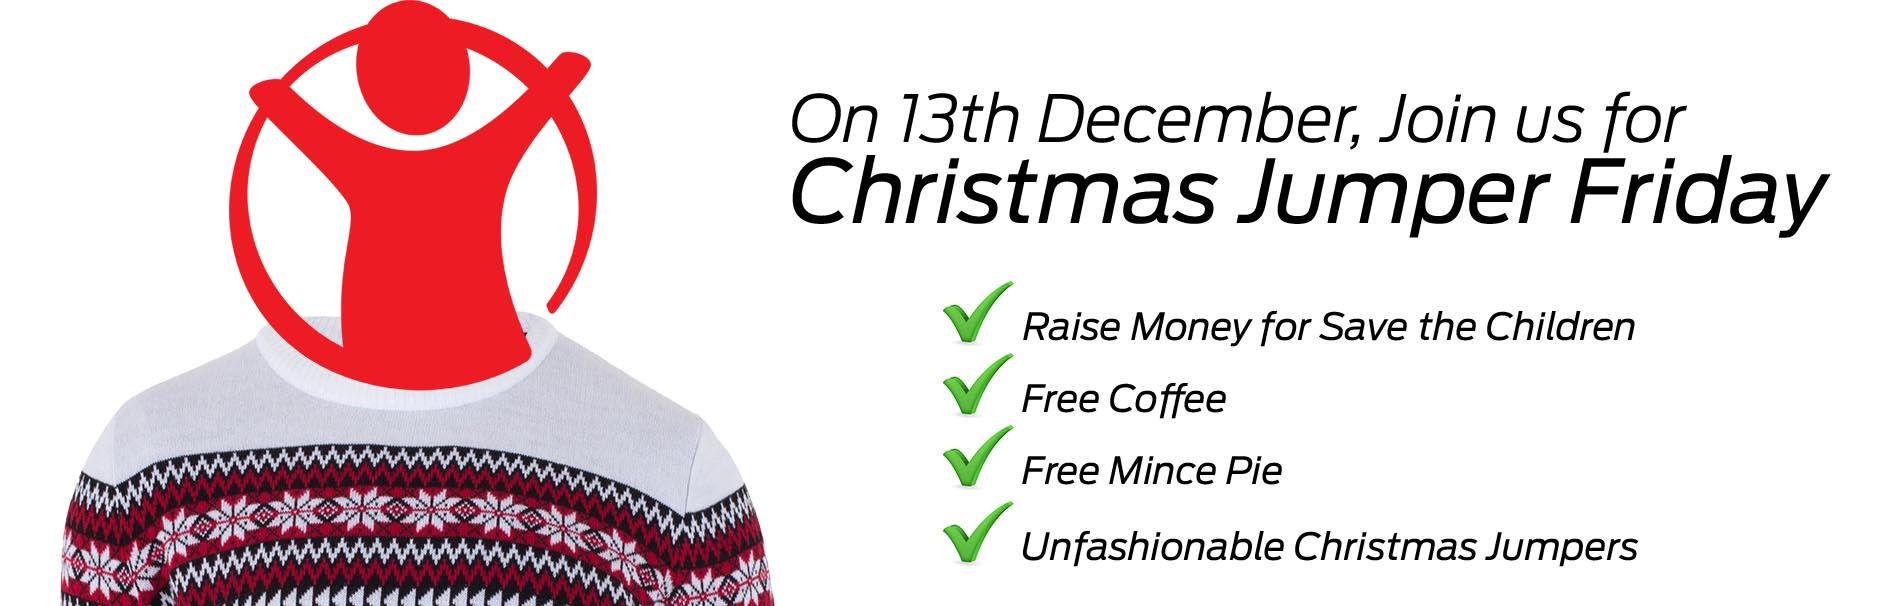 christmas-jumper-friday-save-the-children-aldershot-sli